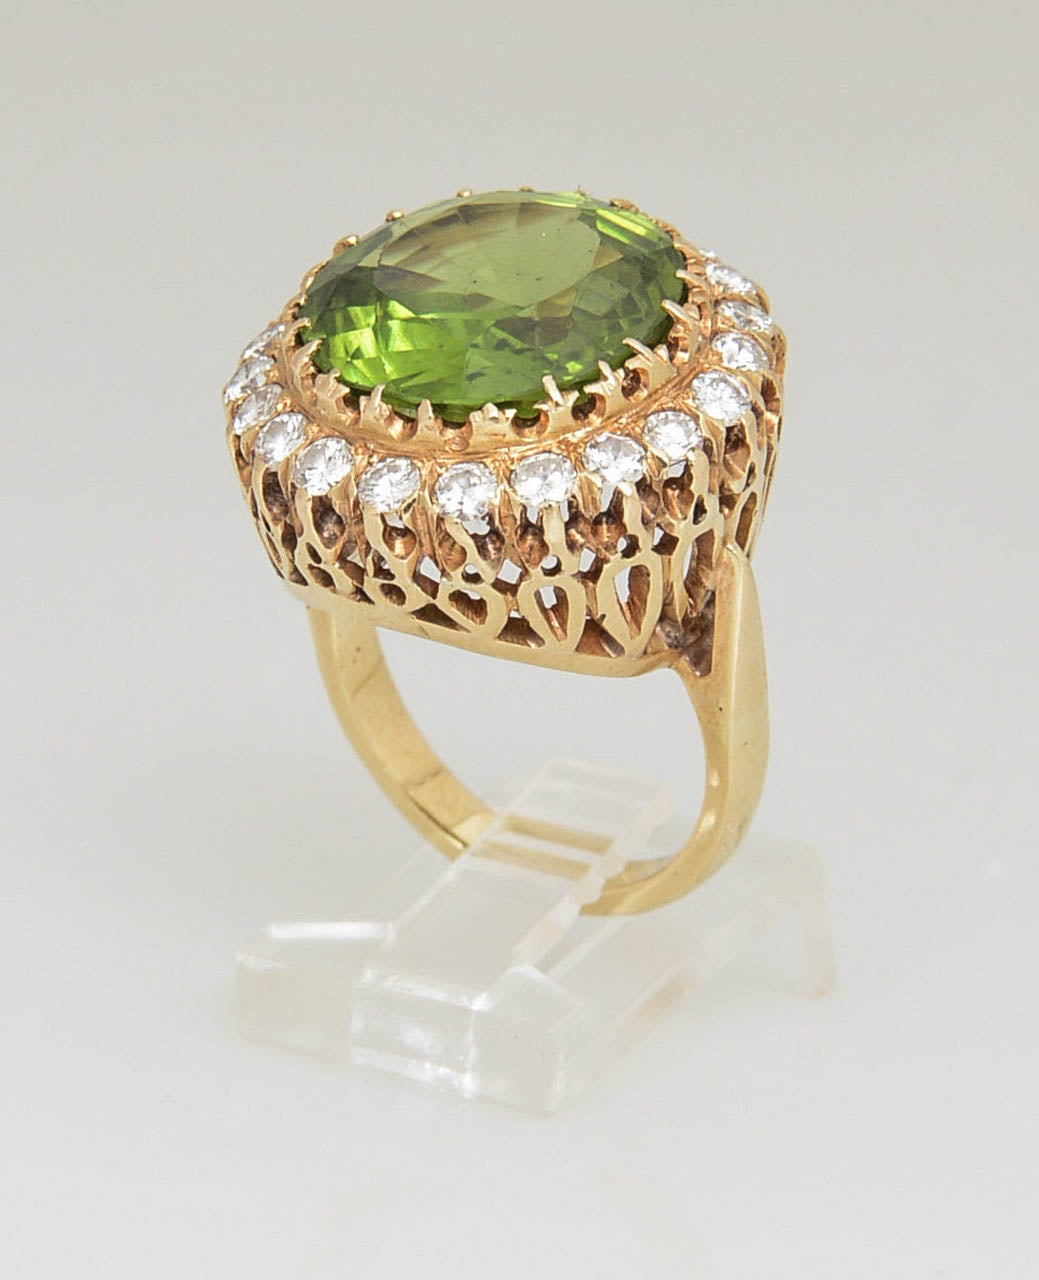 Large Over 15 Carat Peridot Diamond Gold Ring 2